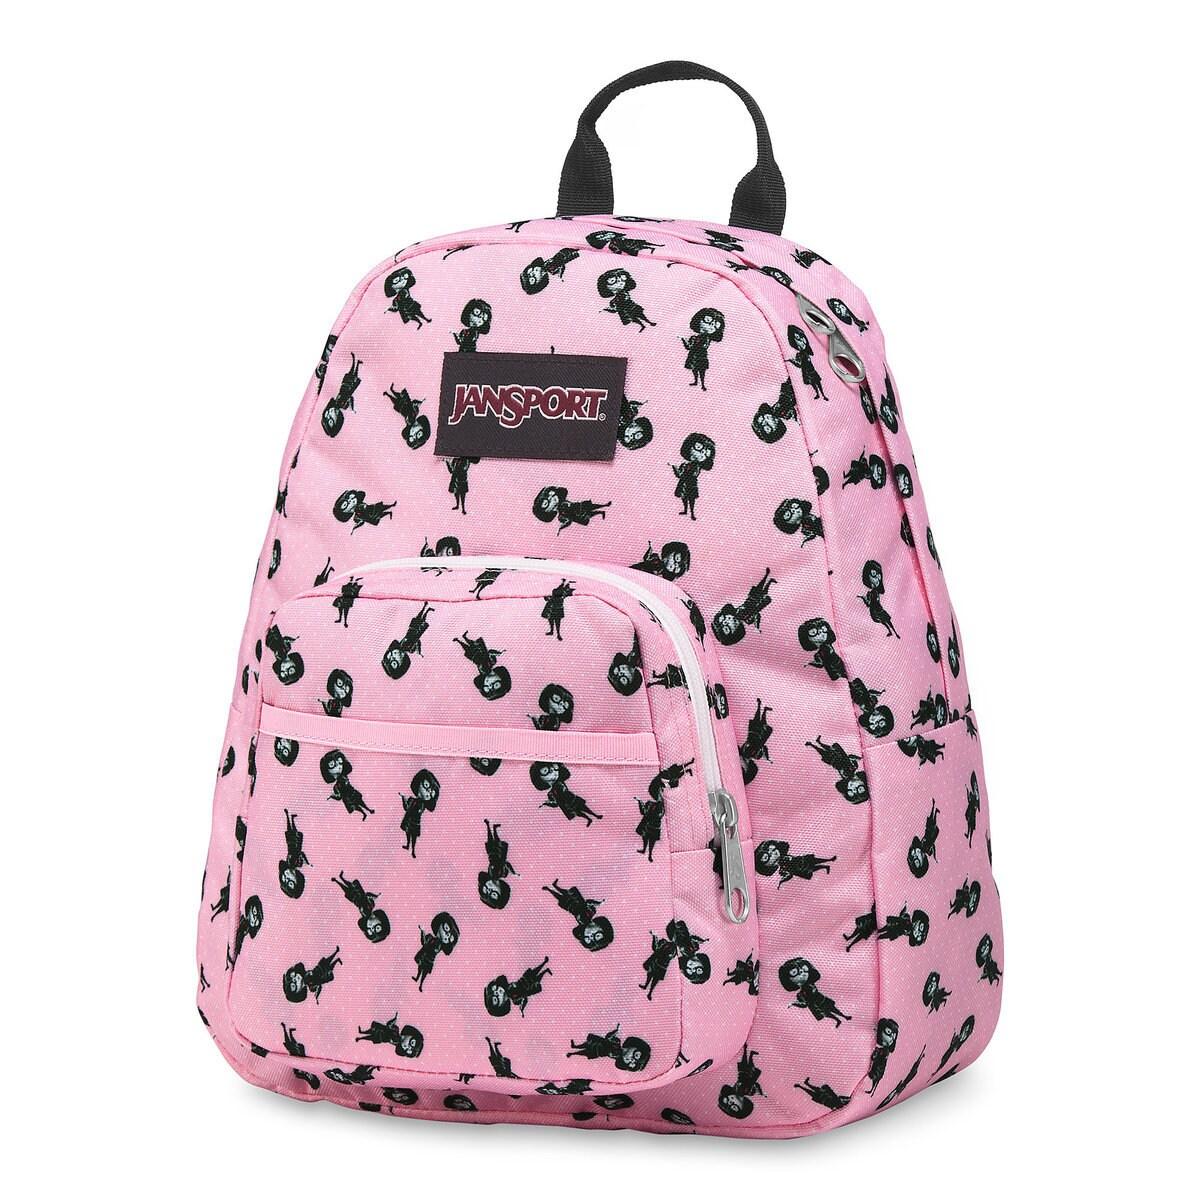 3970522809e Edna Mode Half Pint Mini Backpack by JanSport - Incredibles 2 ...